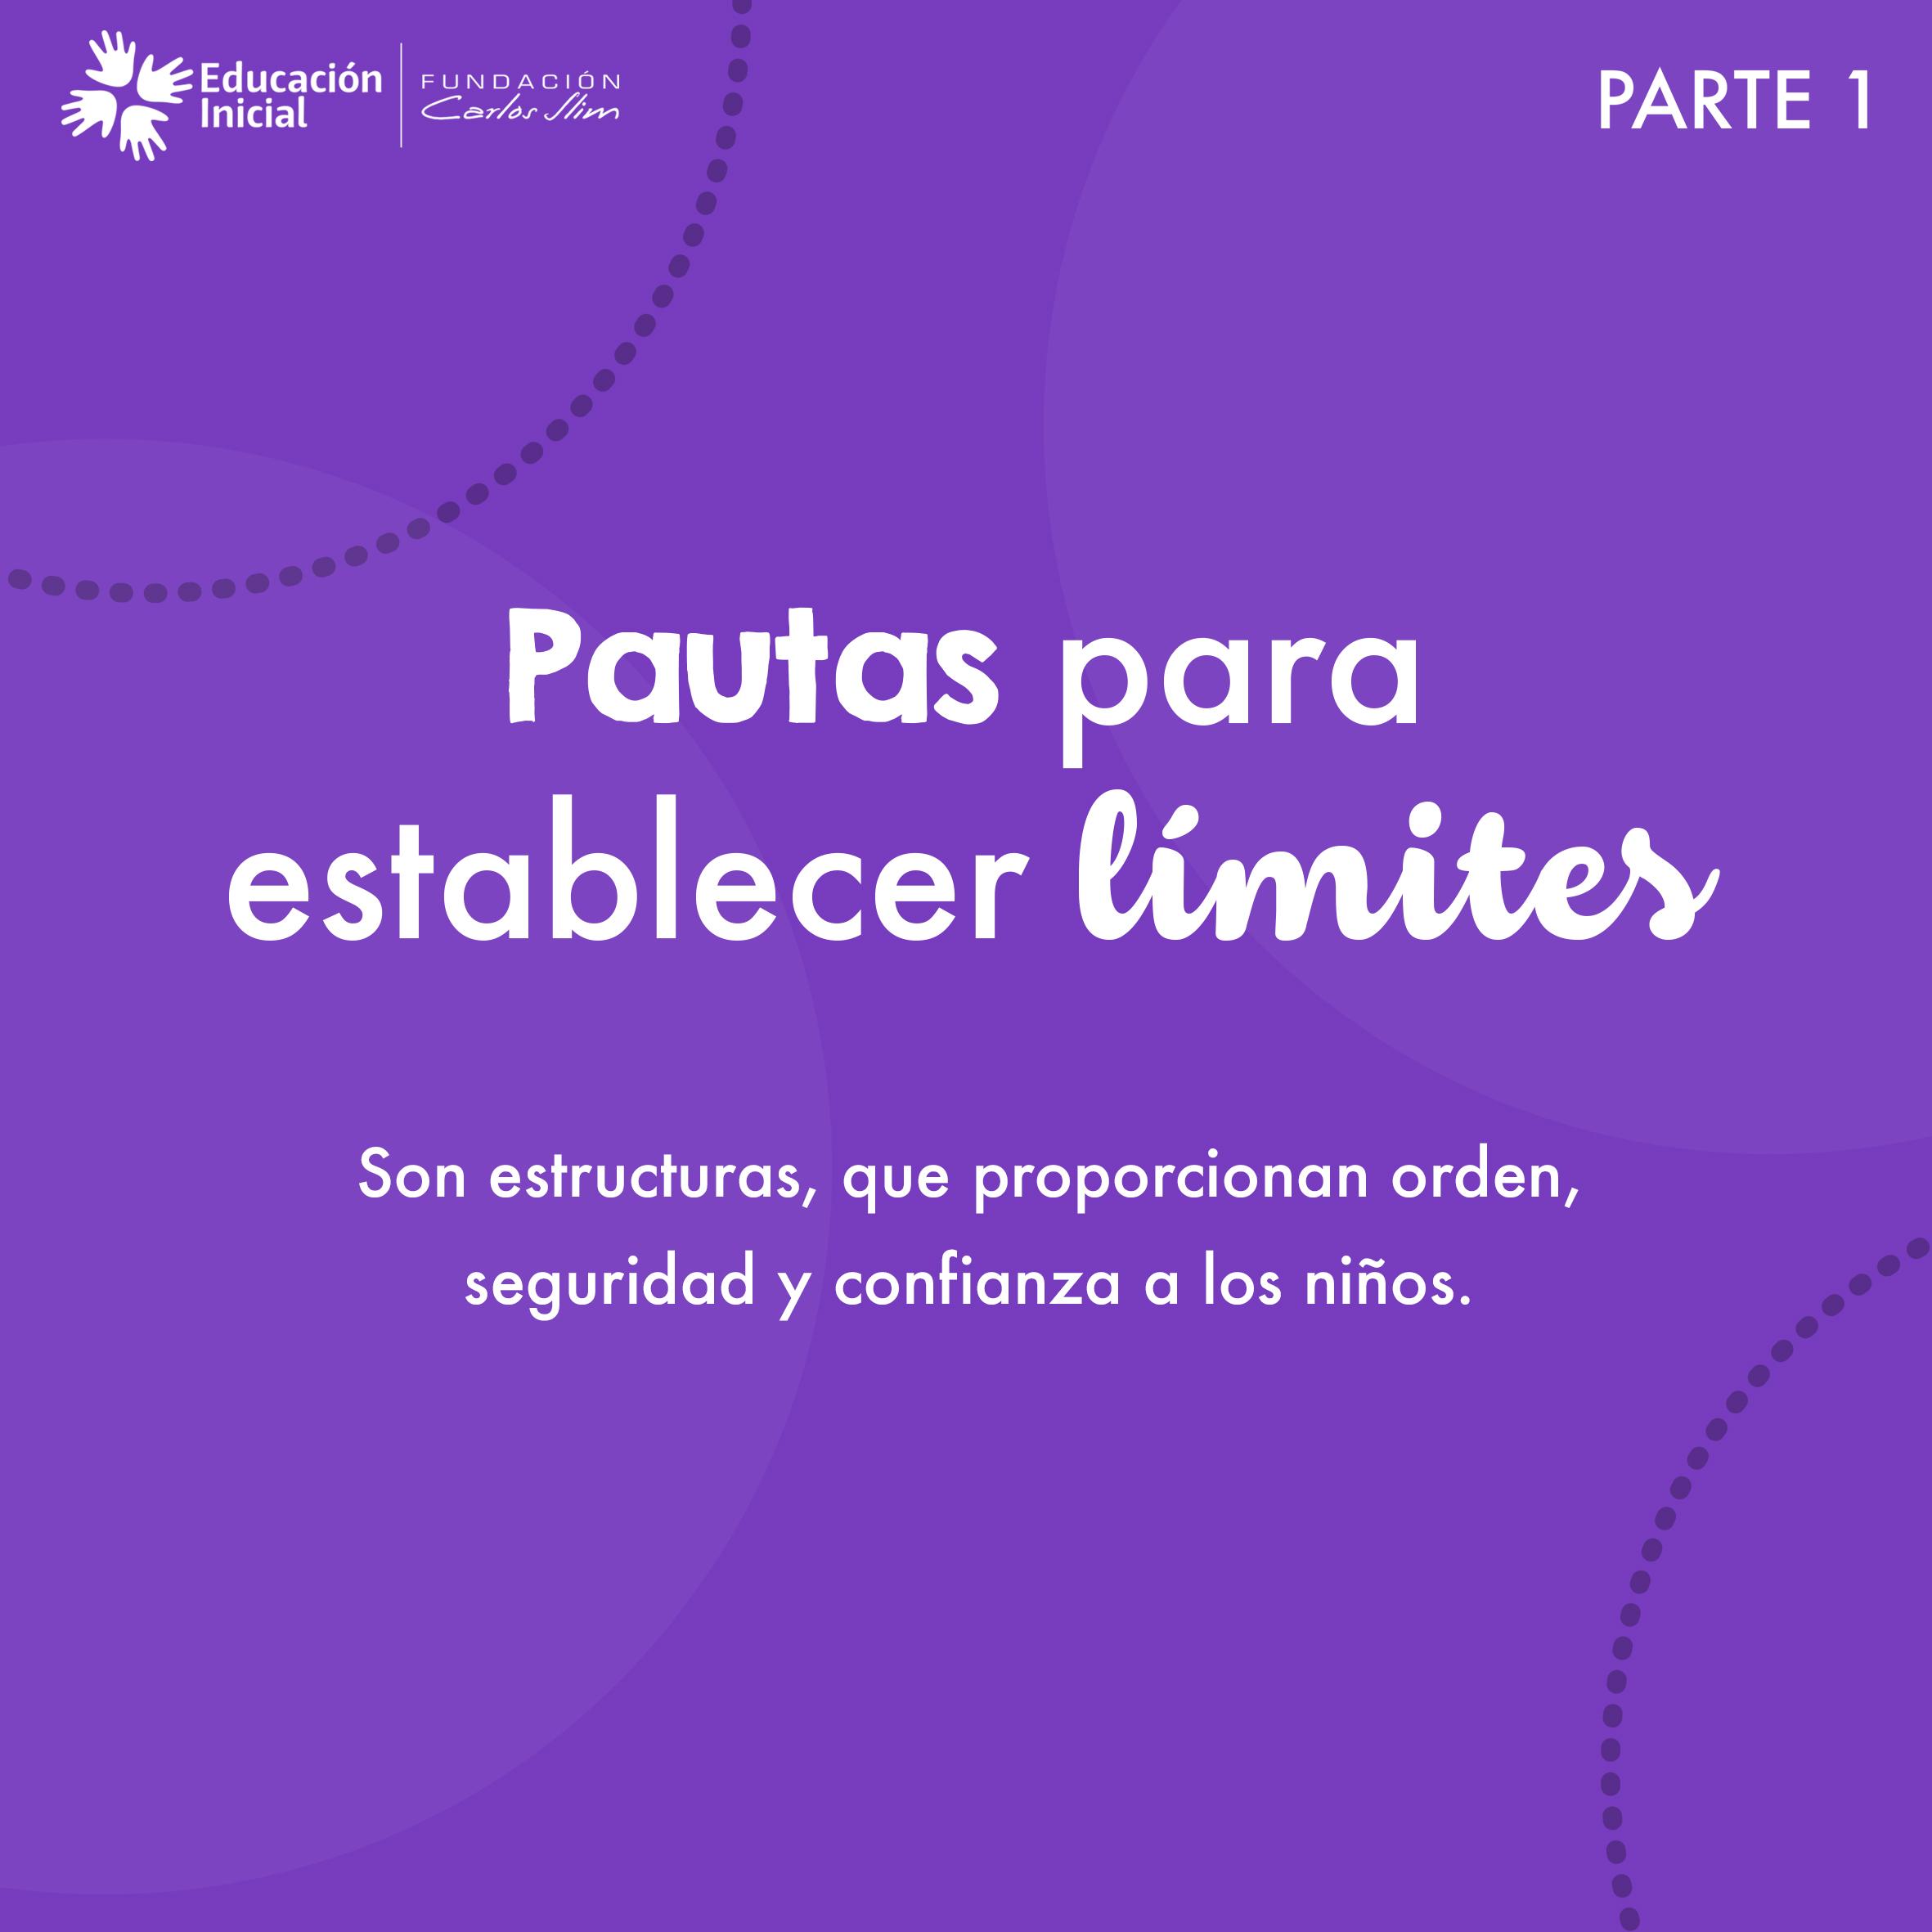 Pautas para establecer límites 1.1